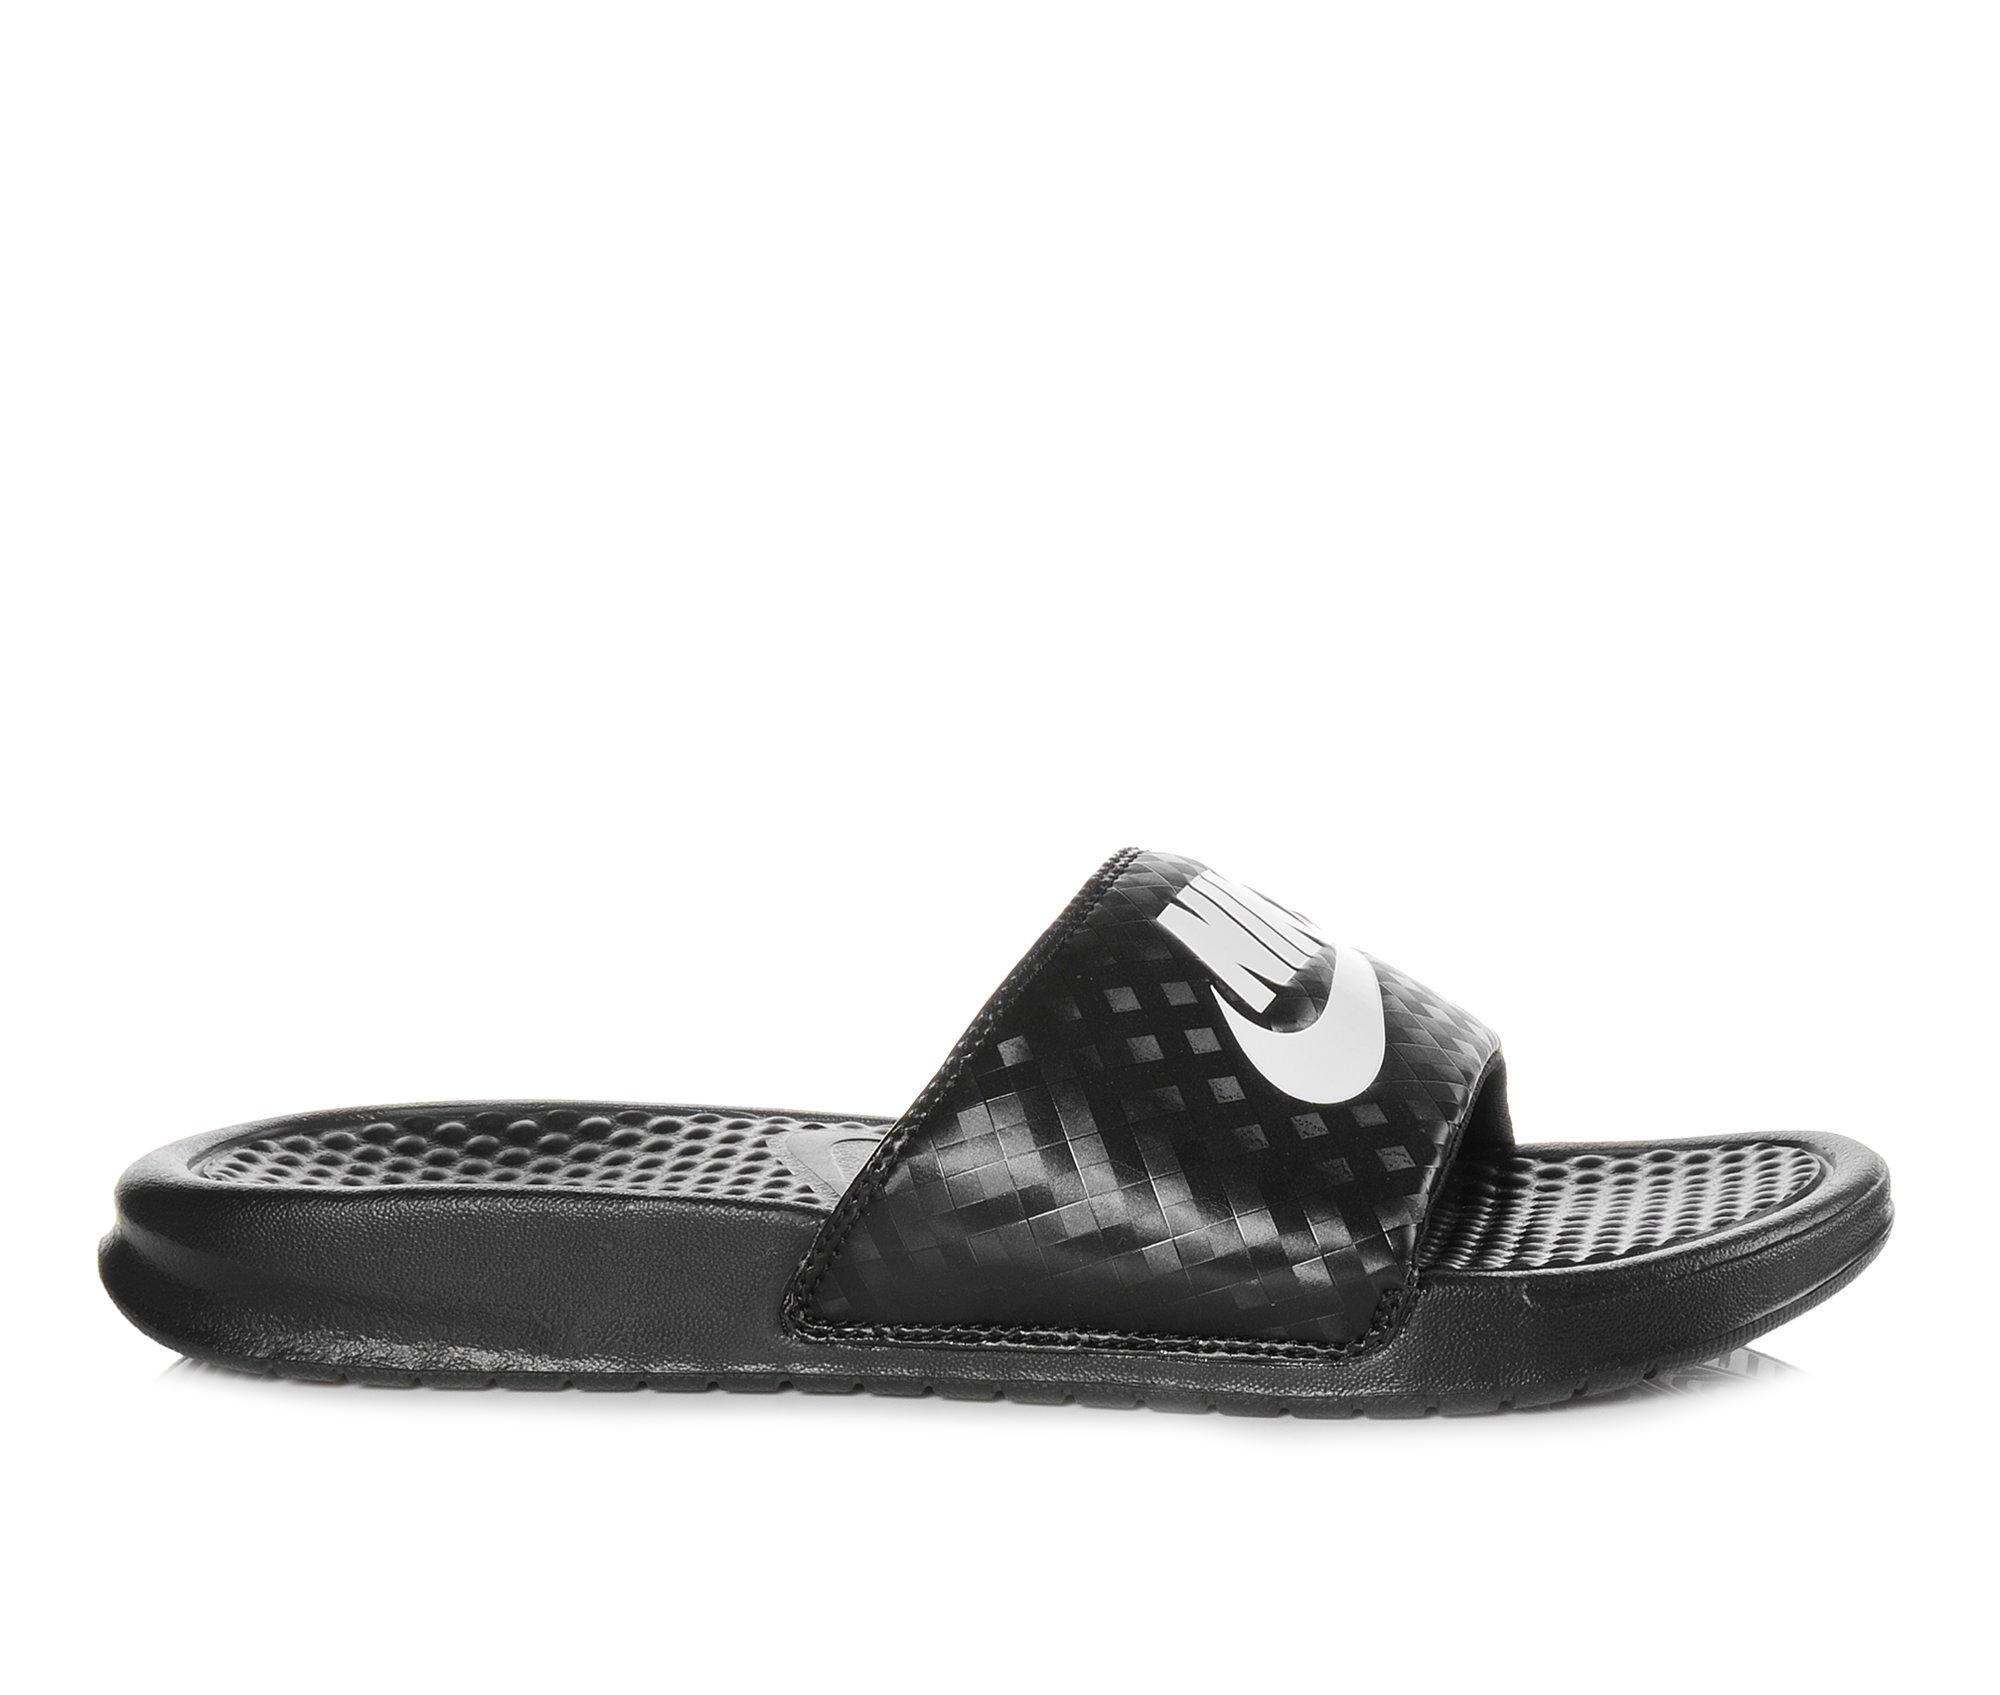 Women's Nike Benassi JDI Slide Sandals Black/White